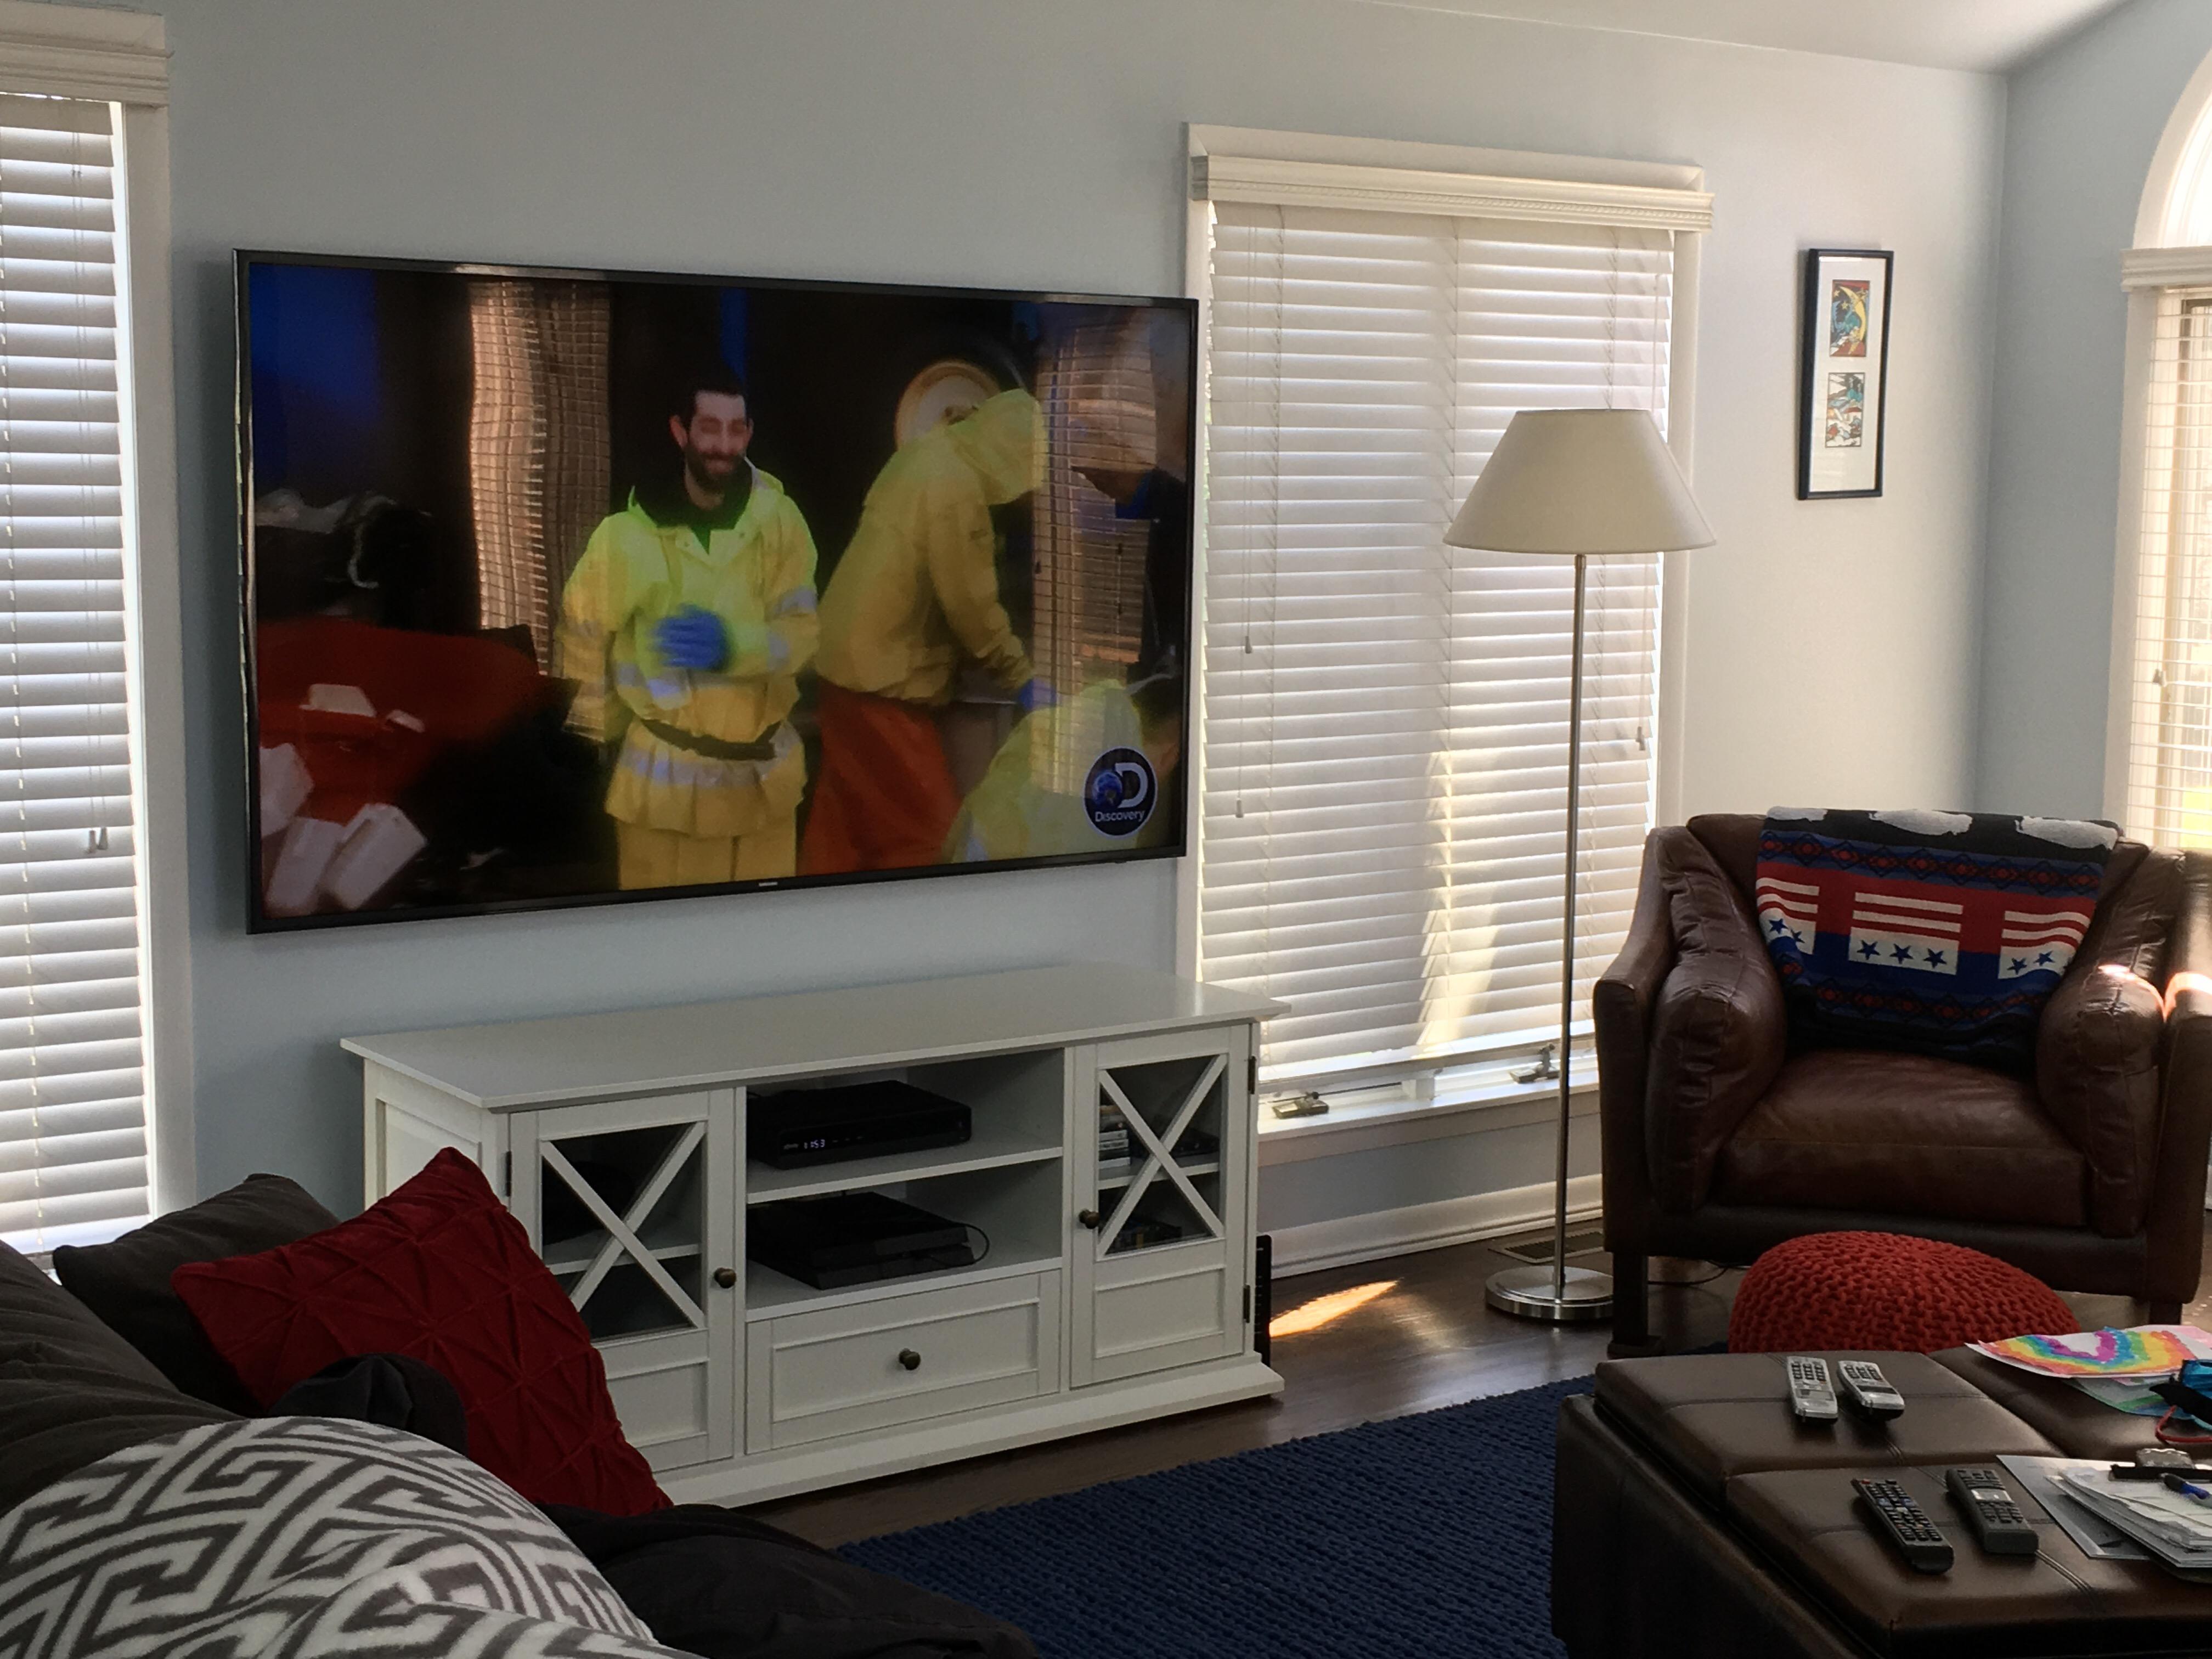 Tv Installation 75 On A Standard Tilt Mount With Concealed Evolution Of Home Wiring